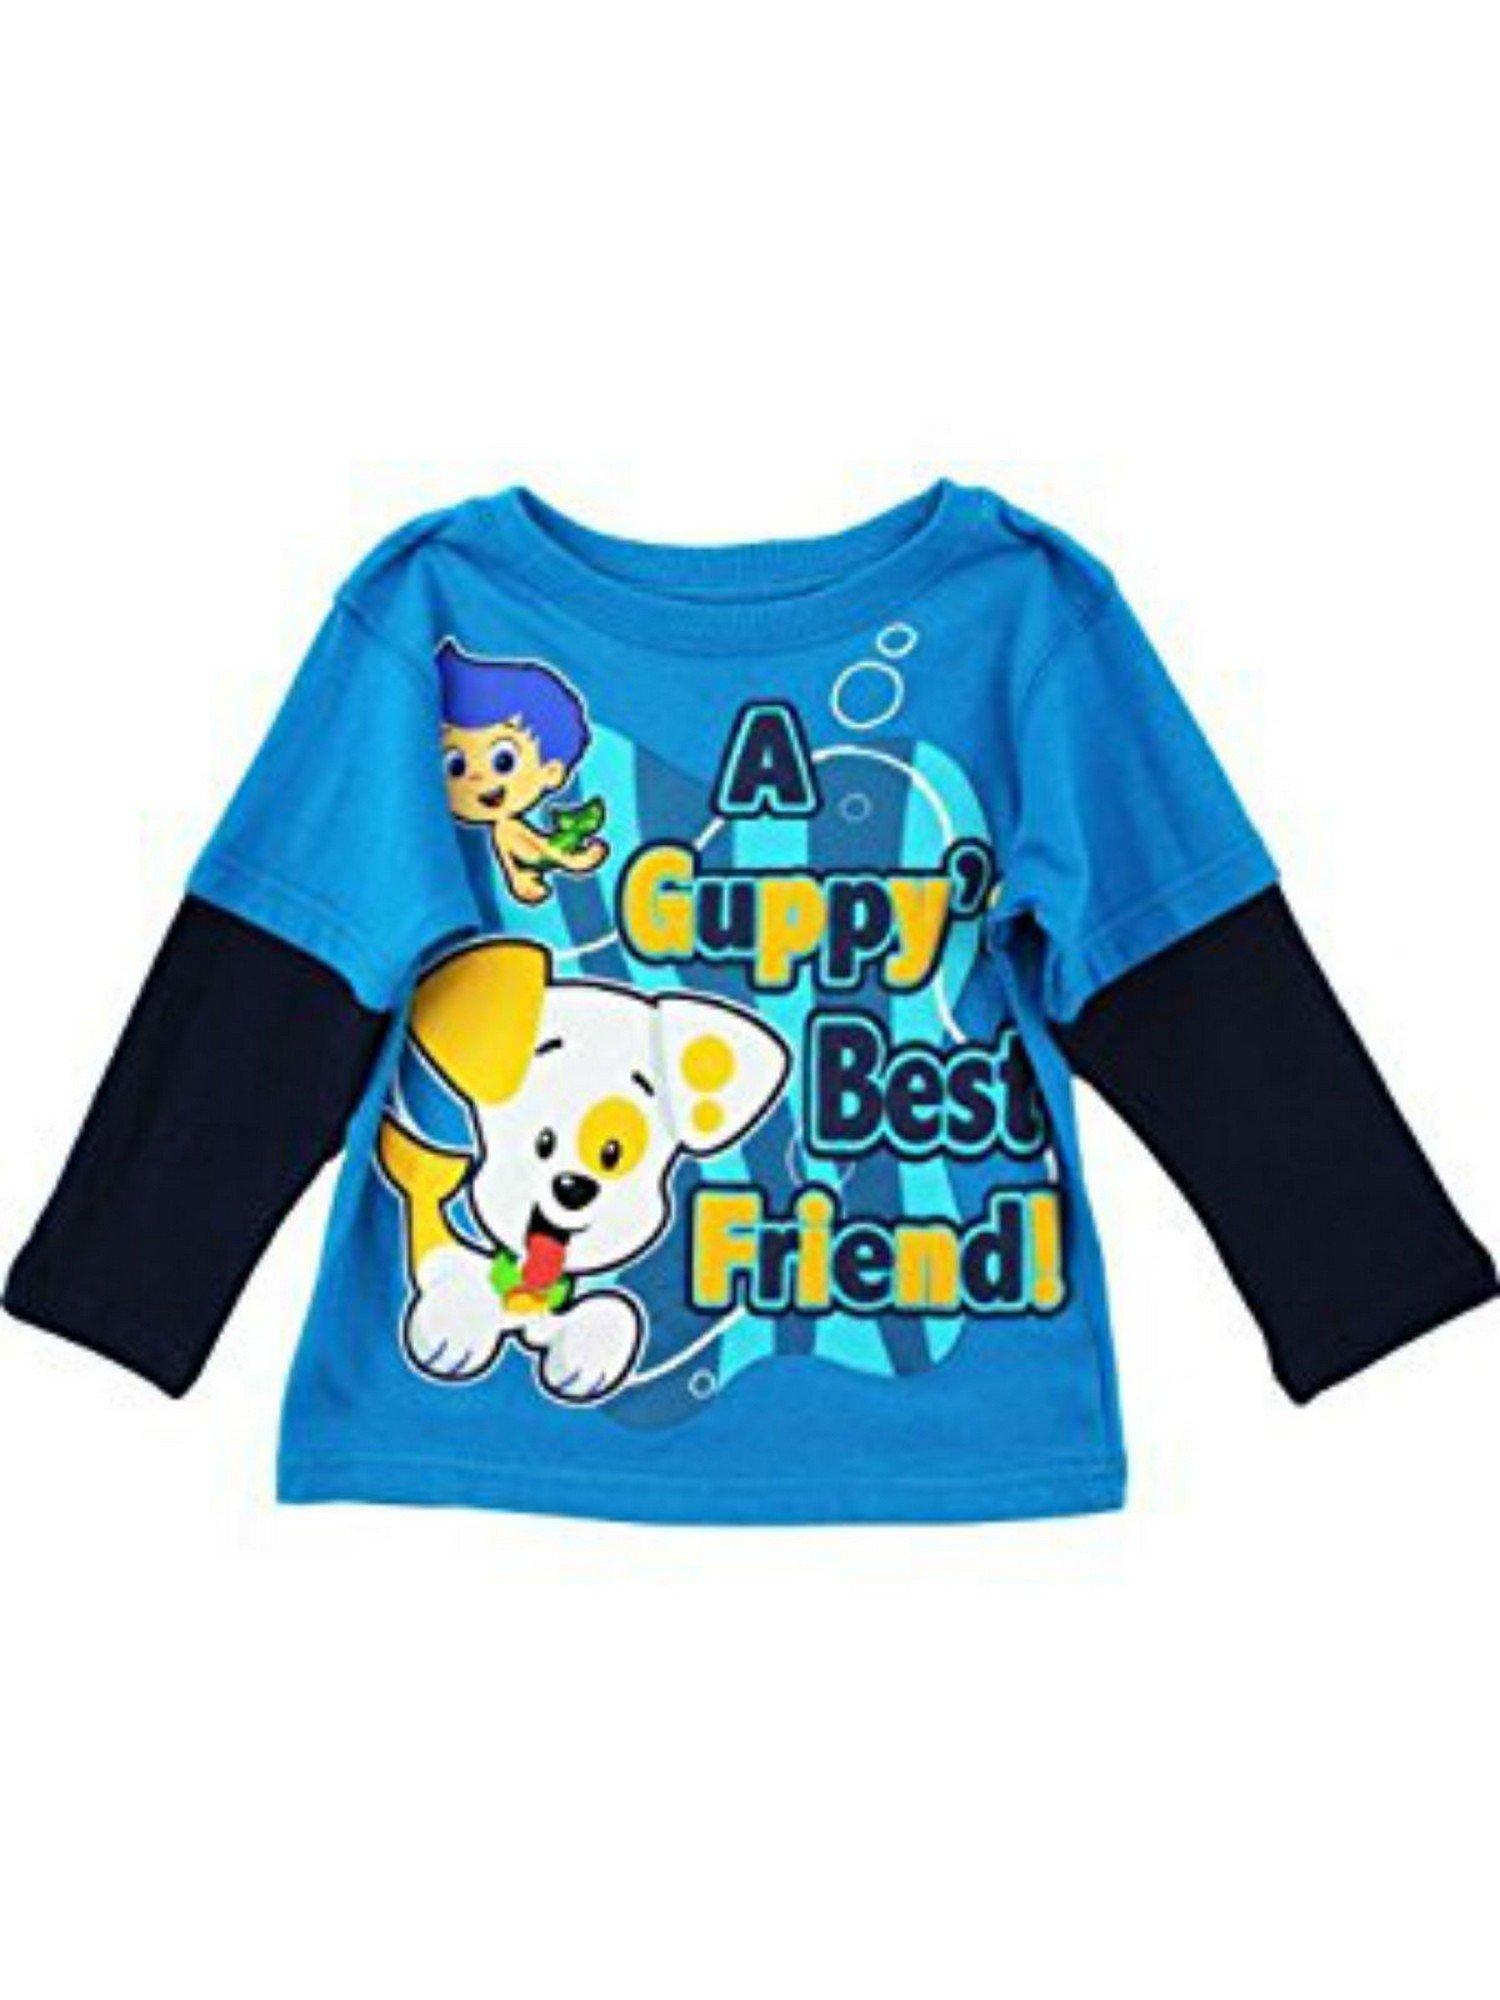 Bubble Guppies Little Boys Blue Cartoon Print Twofer Long Sleeve Top 3T